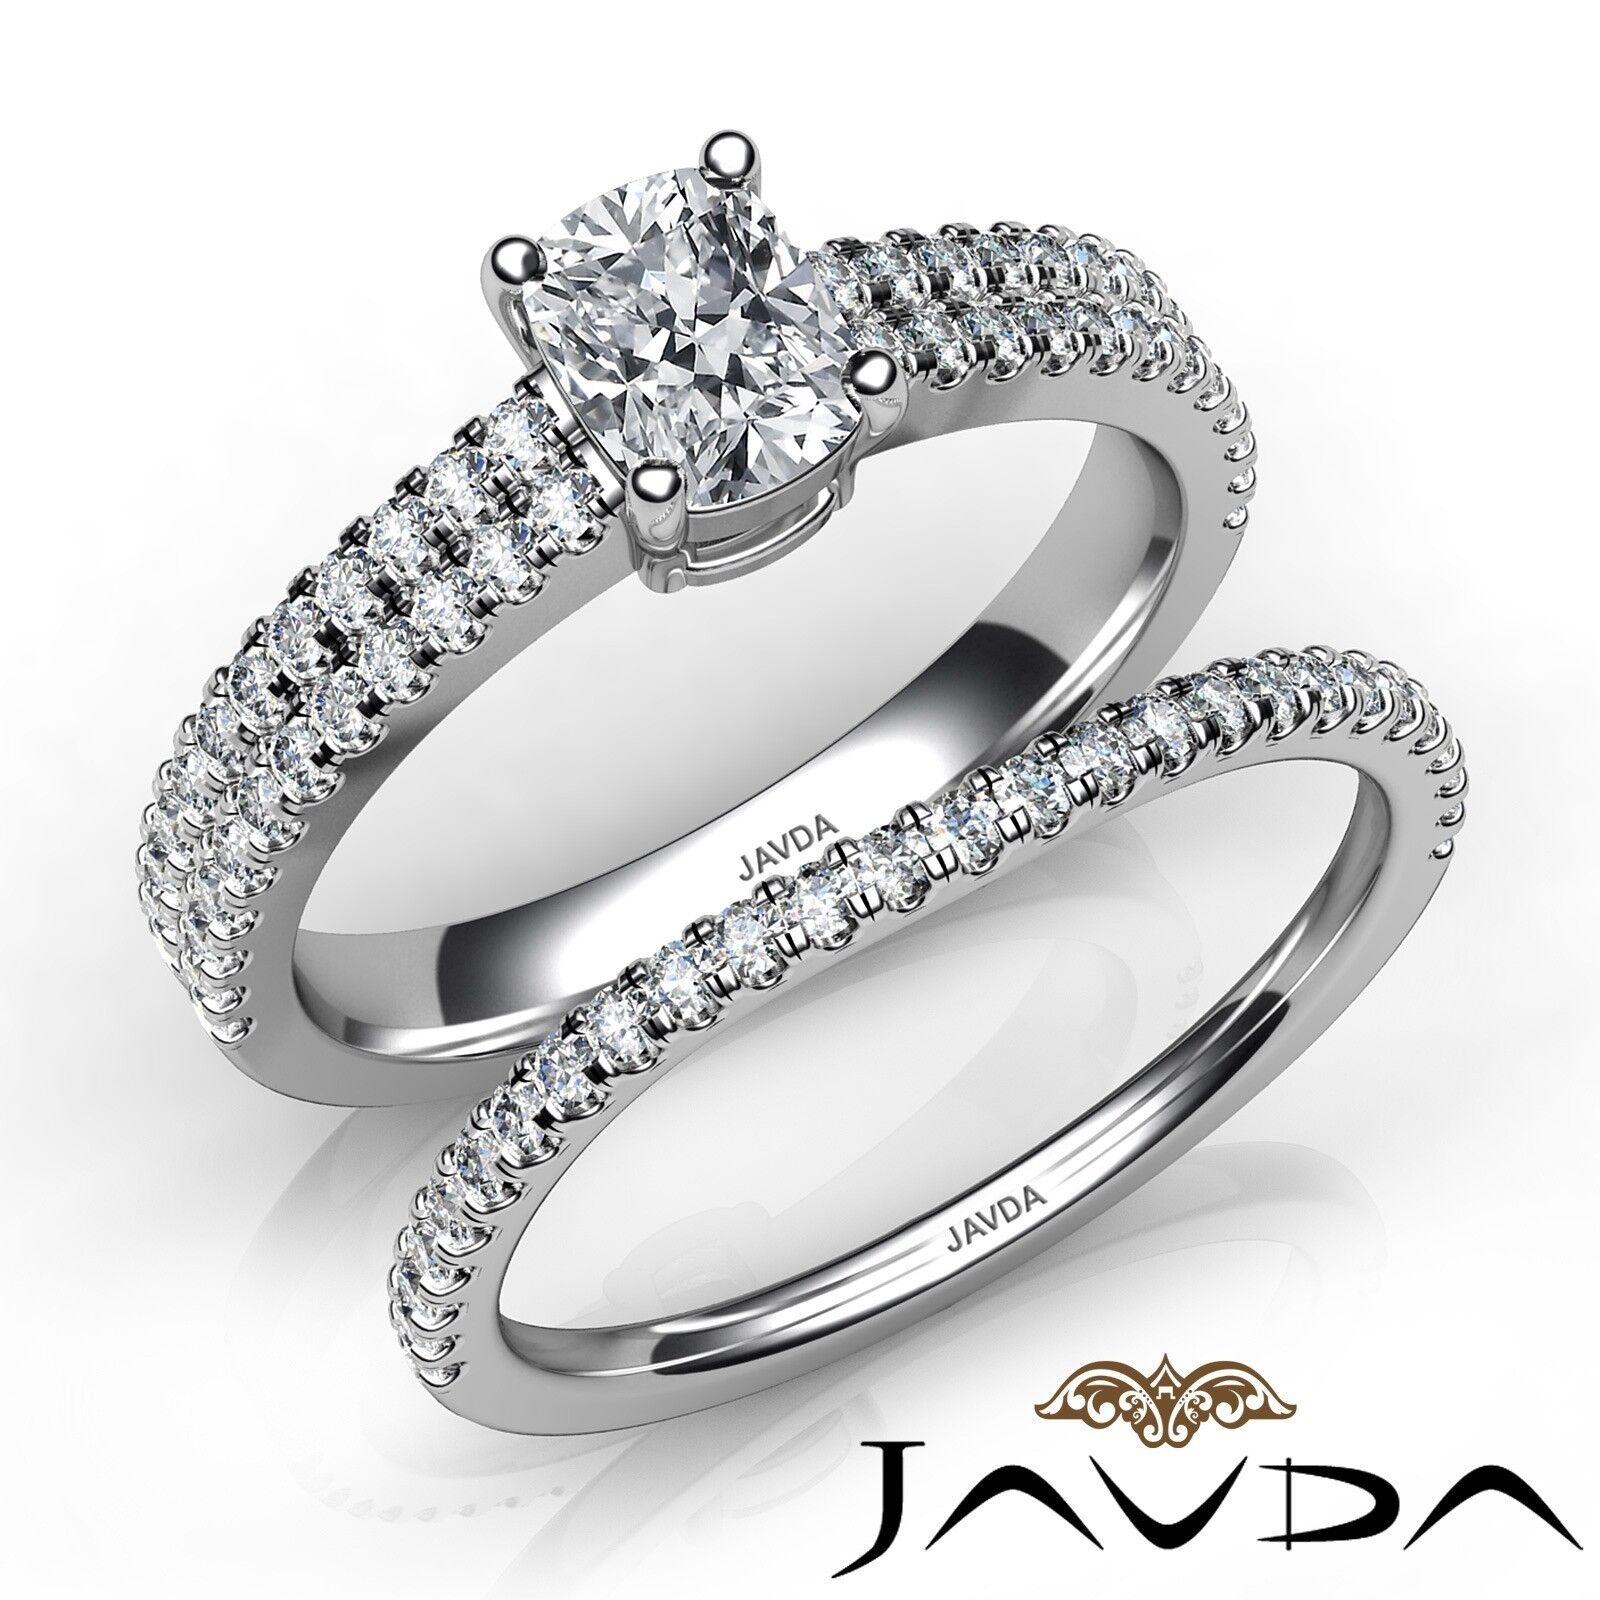 1.8ctw Bridal Scalloped Pave Cushion Diamond Engagement Ring GIA F-VVS2 W Gold